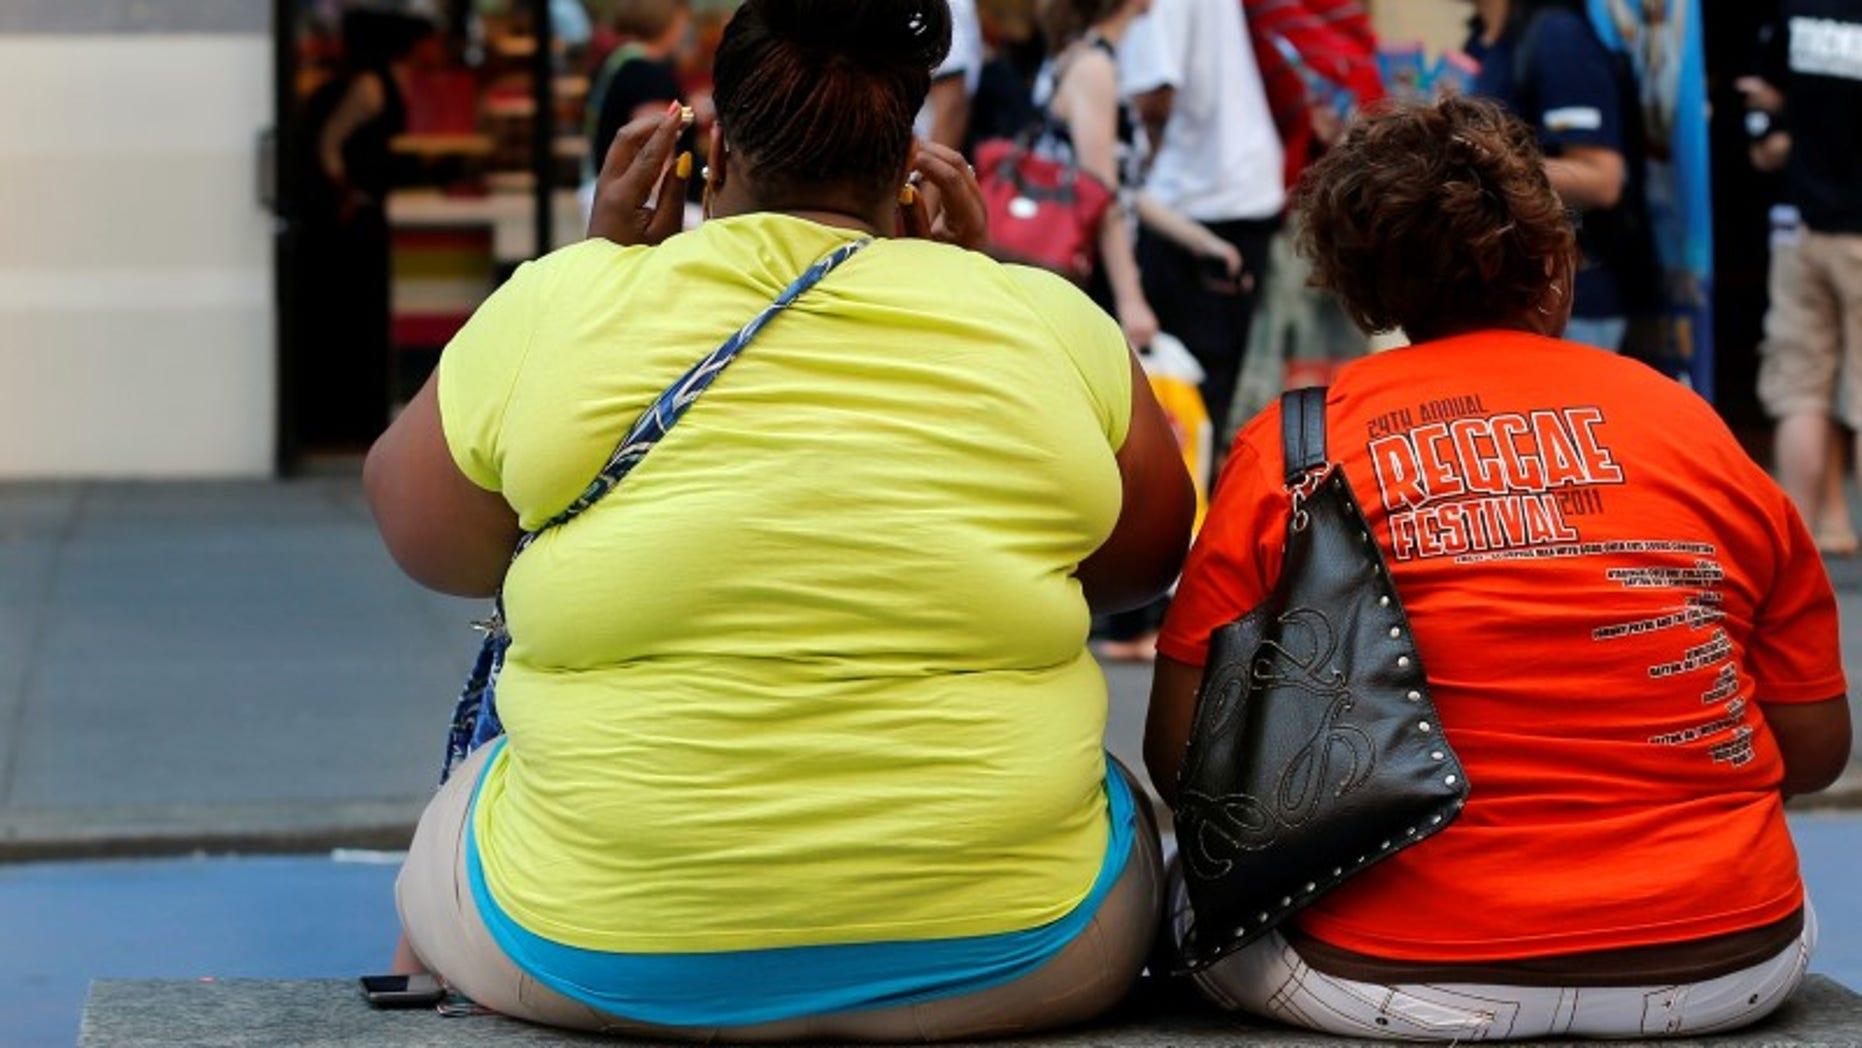 Women sit on bench in New York